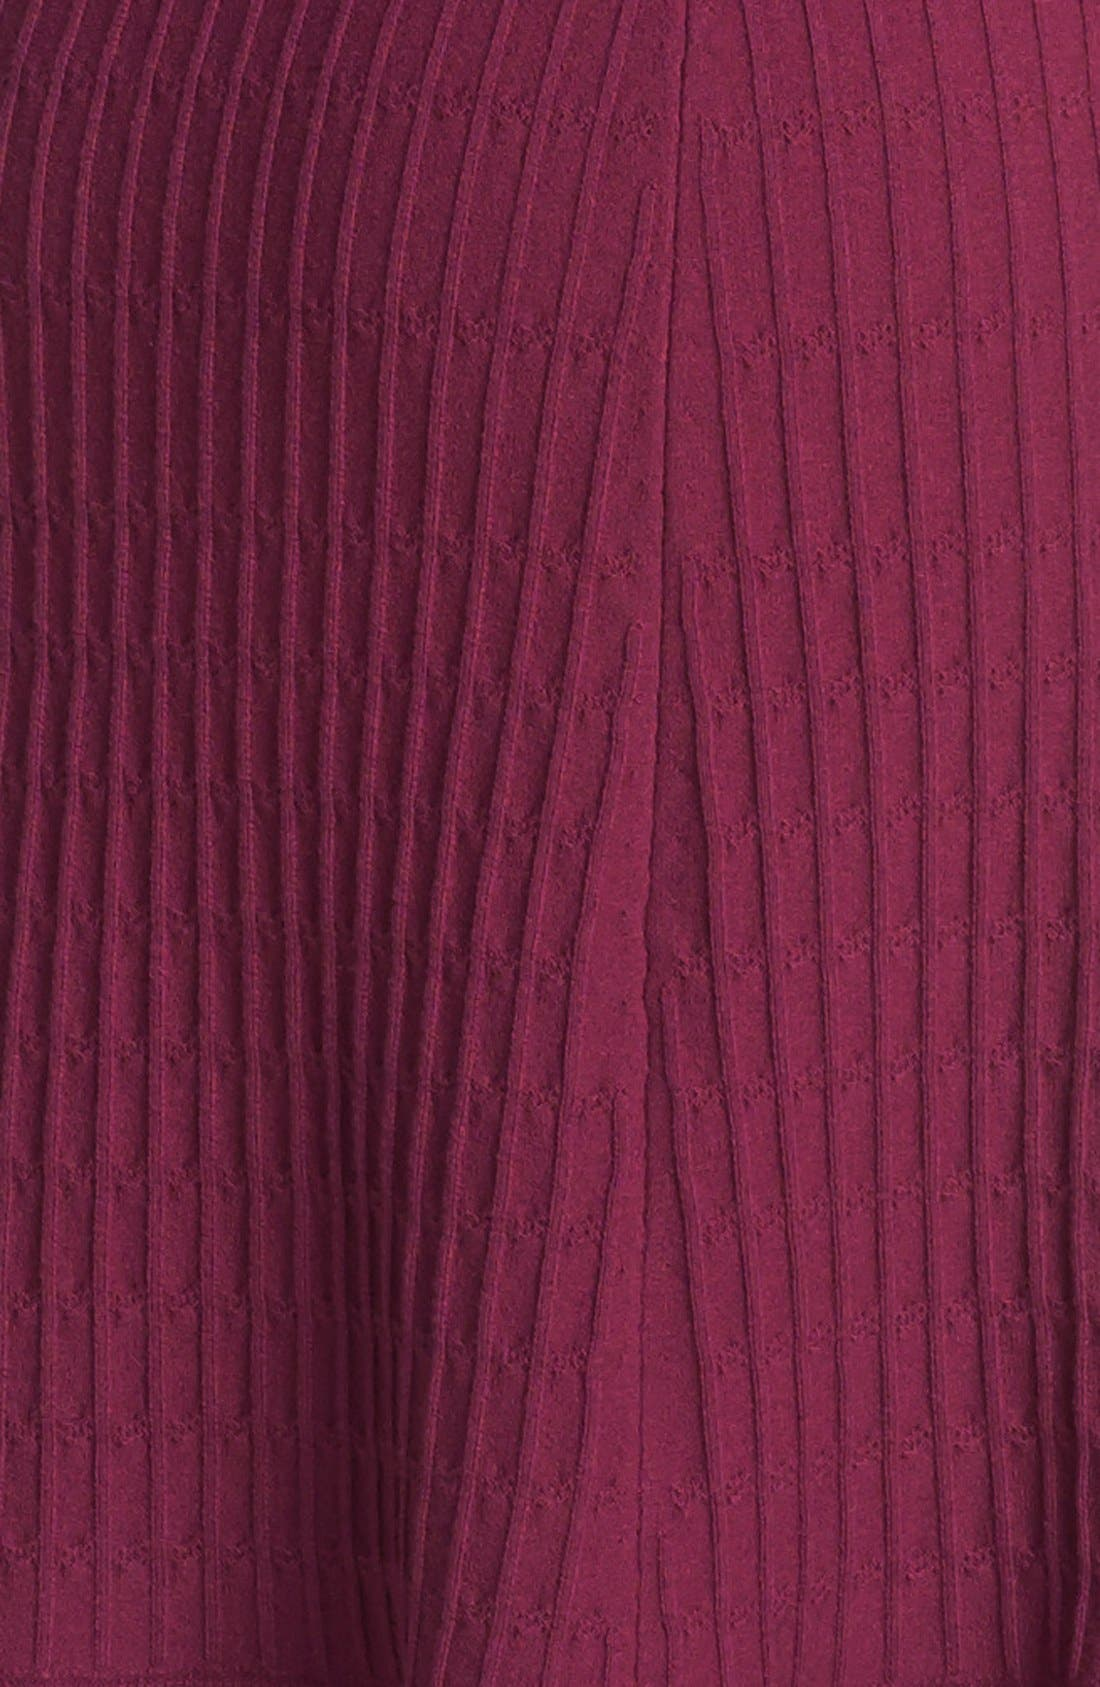 'Ashlyn' Merino Wool Blend Sweater Dress,                             Alternate thumbnail 2, color,